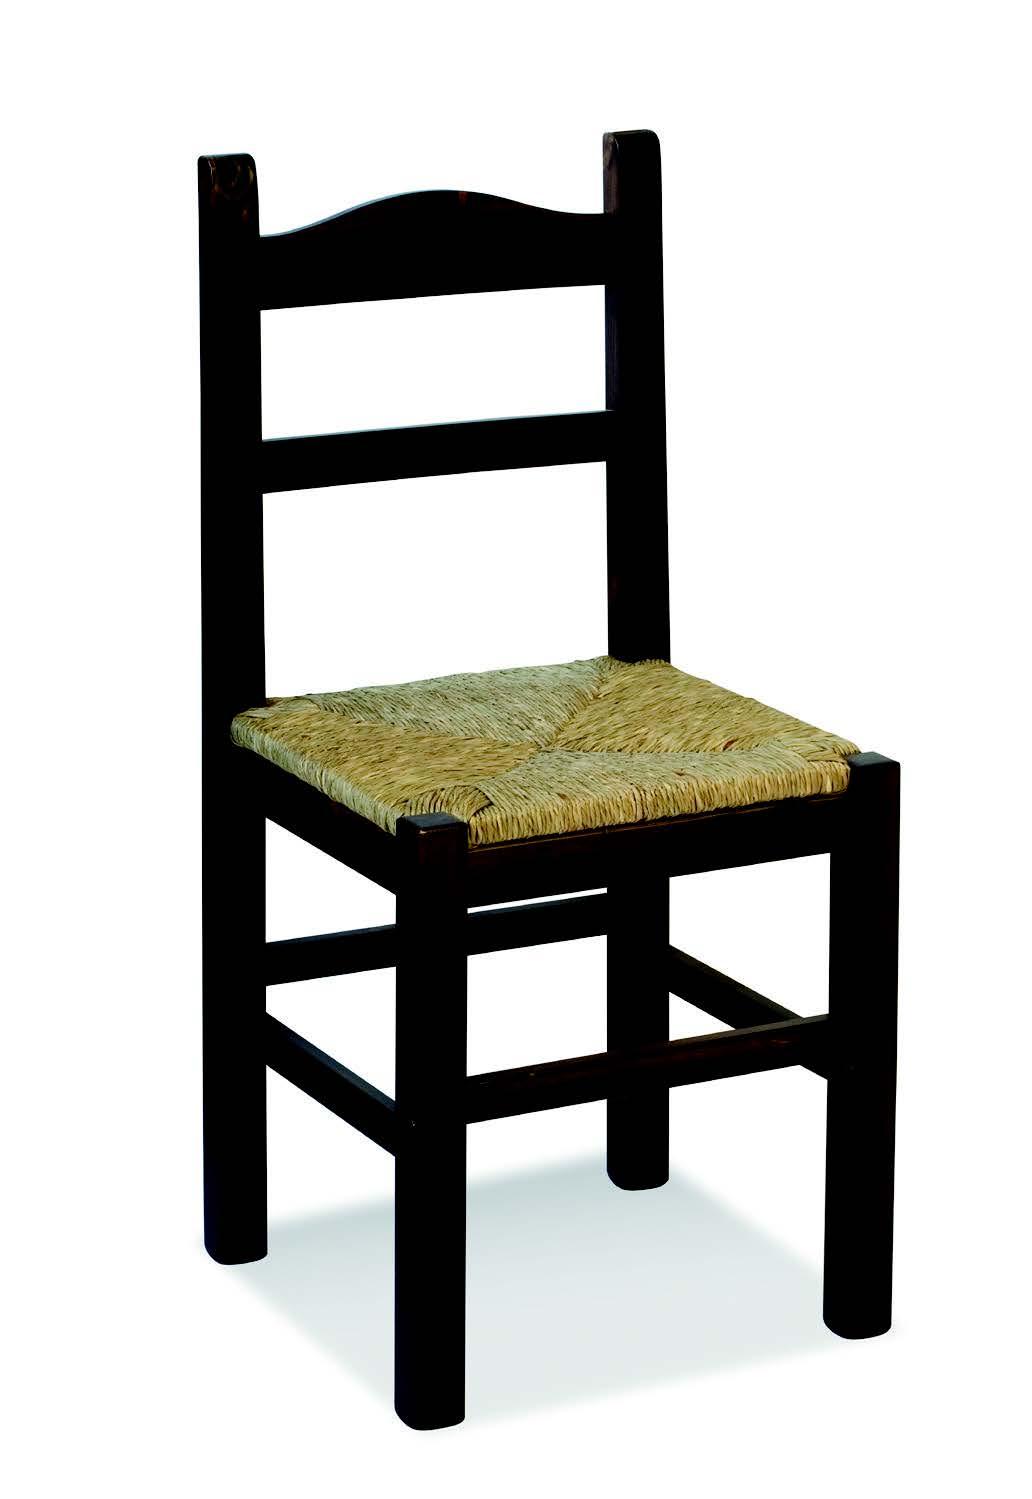 Sedia rita galimberti sedie e tavoli for Galimberti sedie